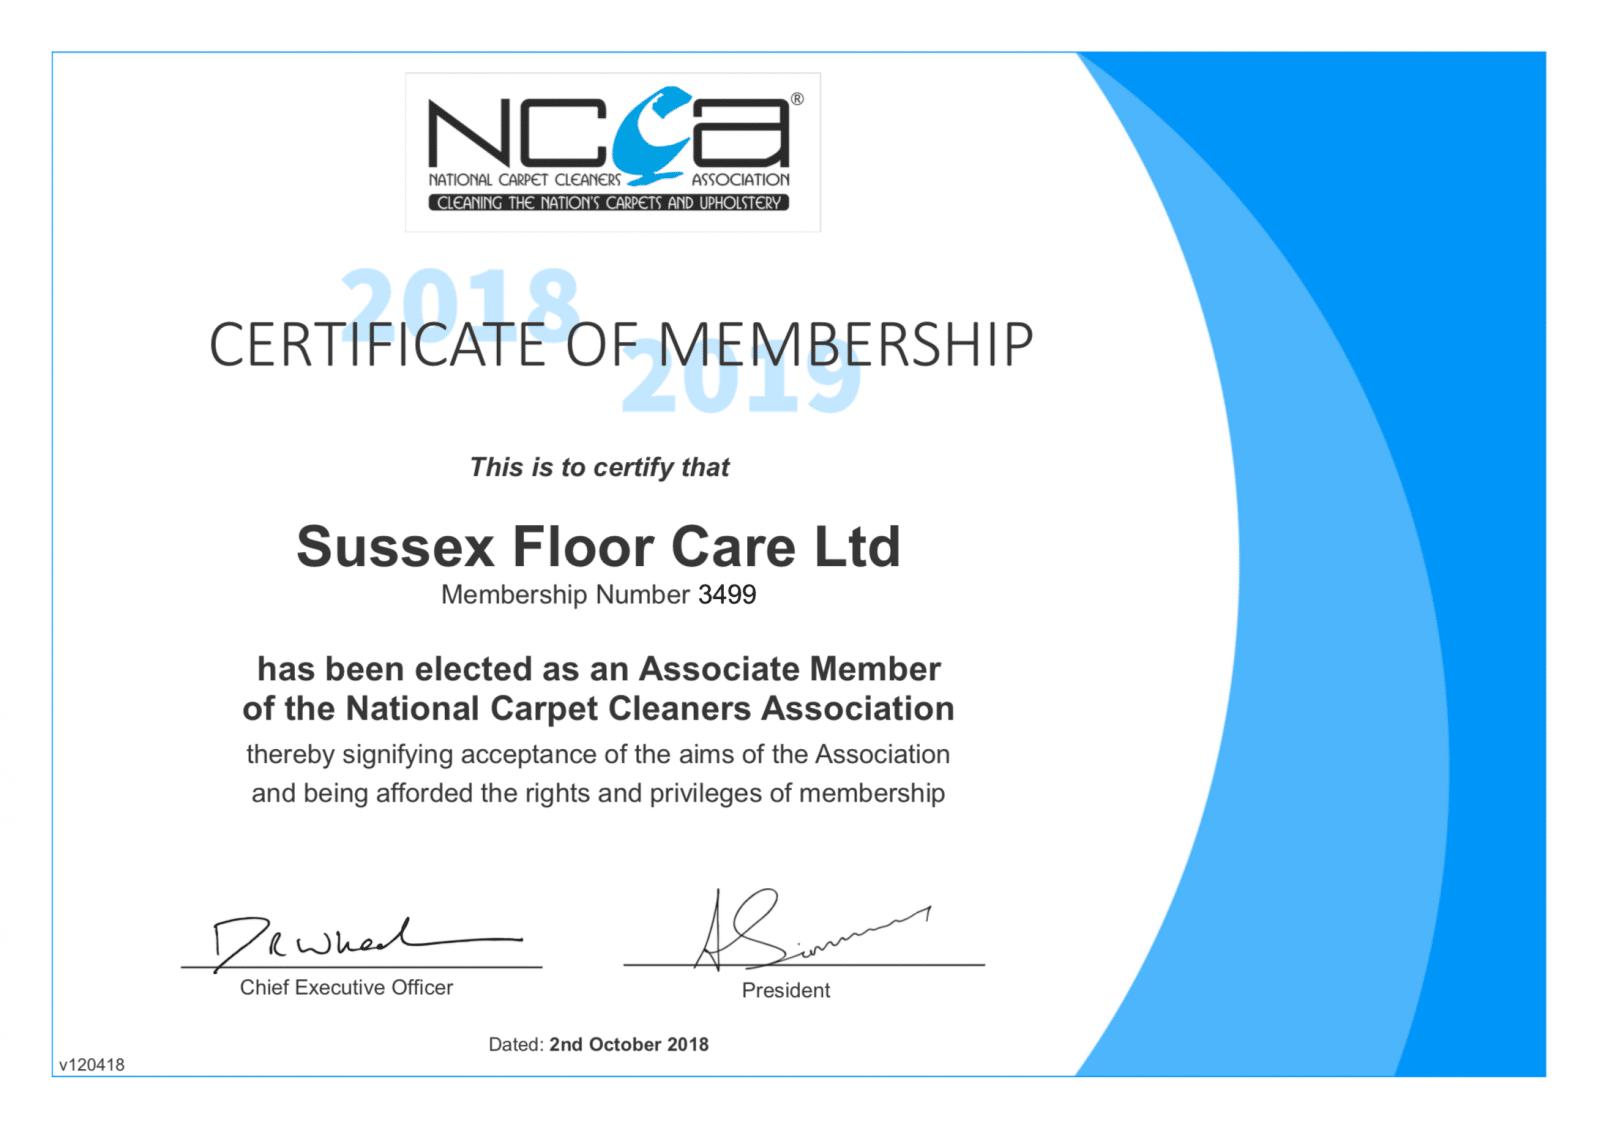 NCCA Membership